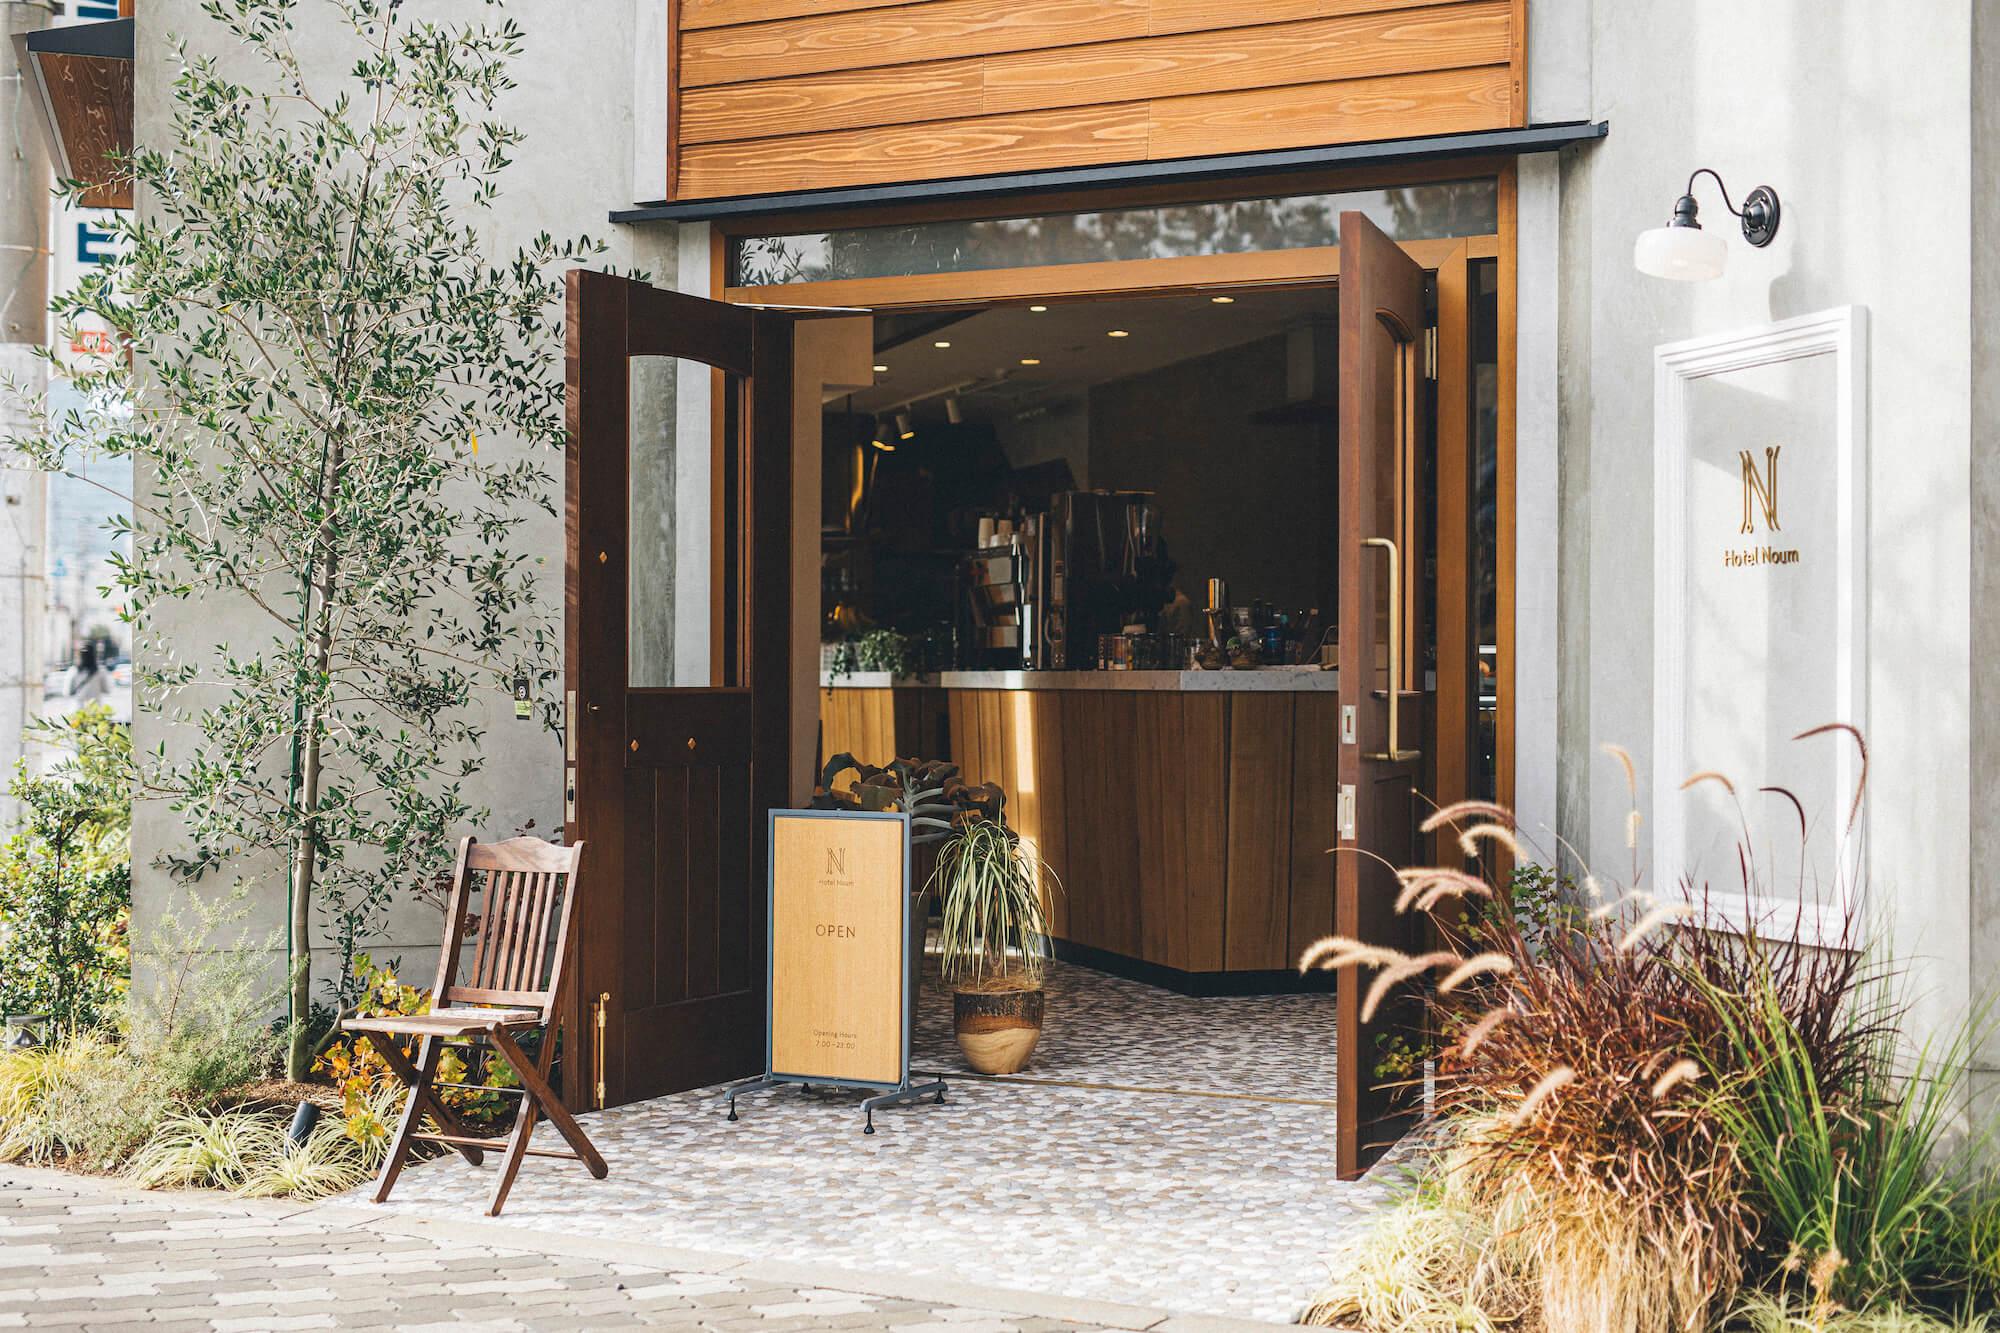 Hotel Noum OSAKA 宿泊レビュー!自宅におしゃれなカフェラウンジがある生活、始めませんか